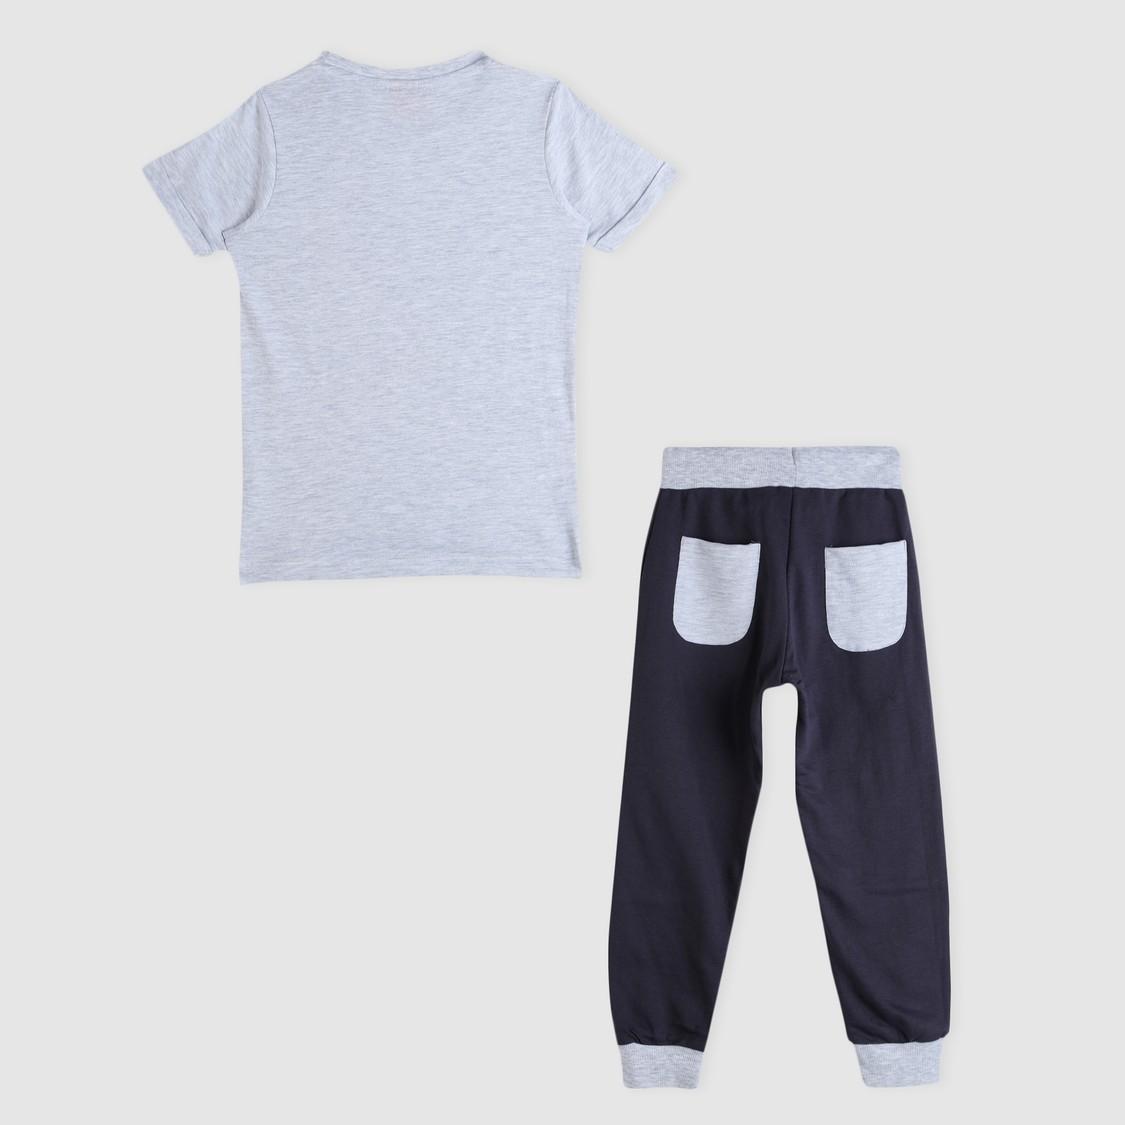 Transformers Print T-Shirt and Jog Pants Set